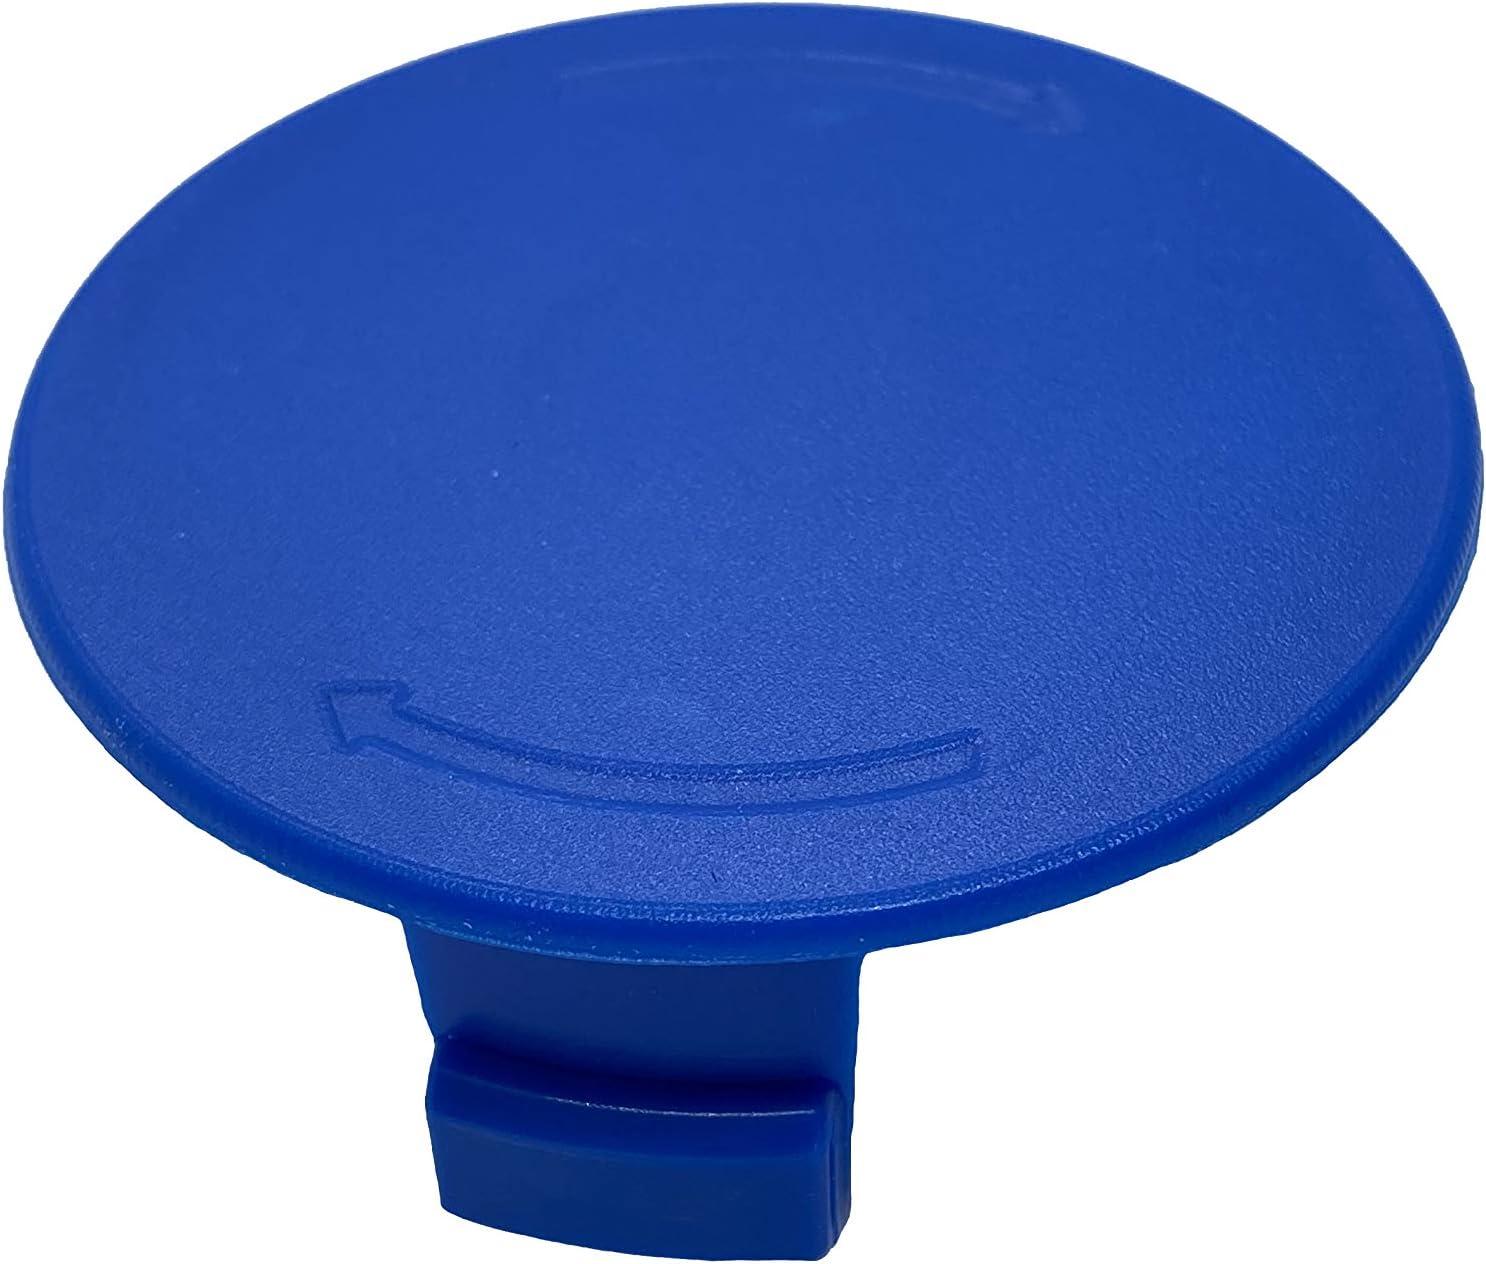 Kobalt 40-Volt Replacement Spool Cap 40 V Blue Spool Cover for Cordless String Trimmer